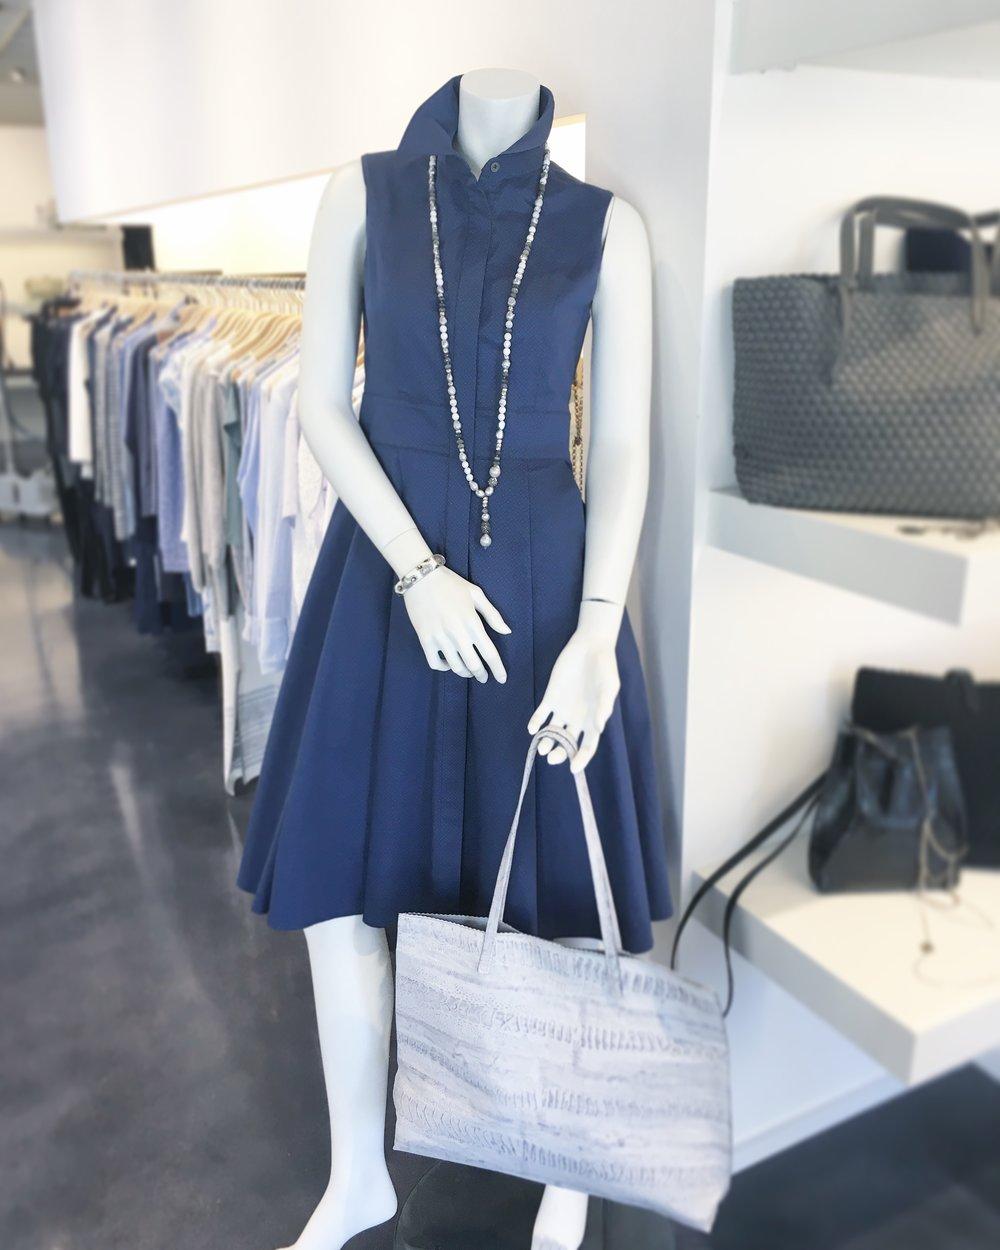 XANDER Indigo: The Classy Dress